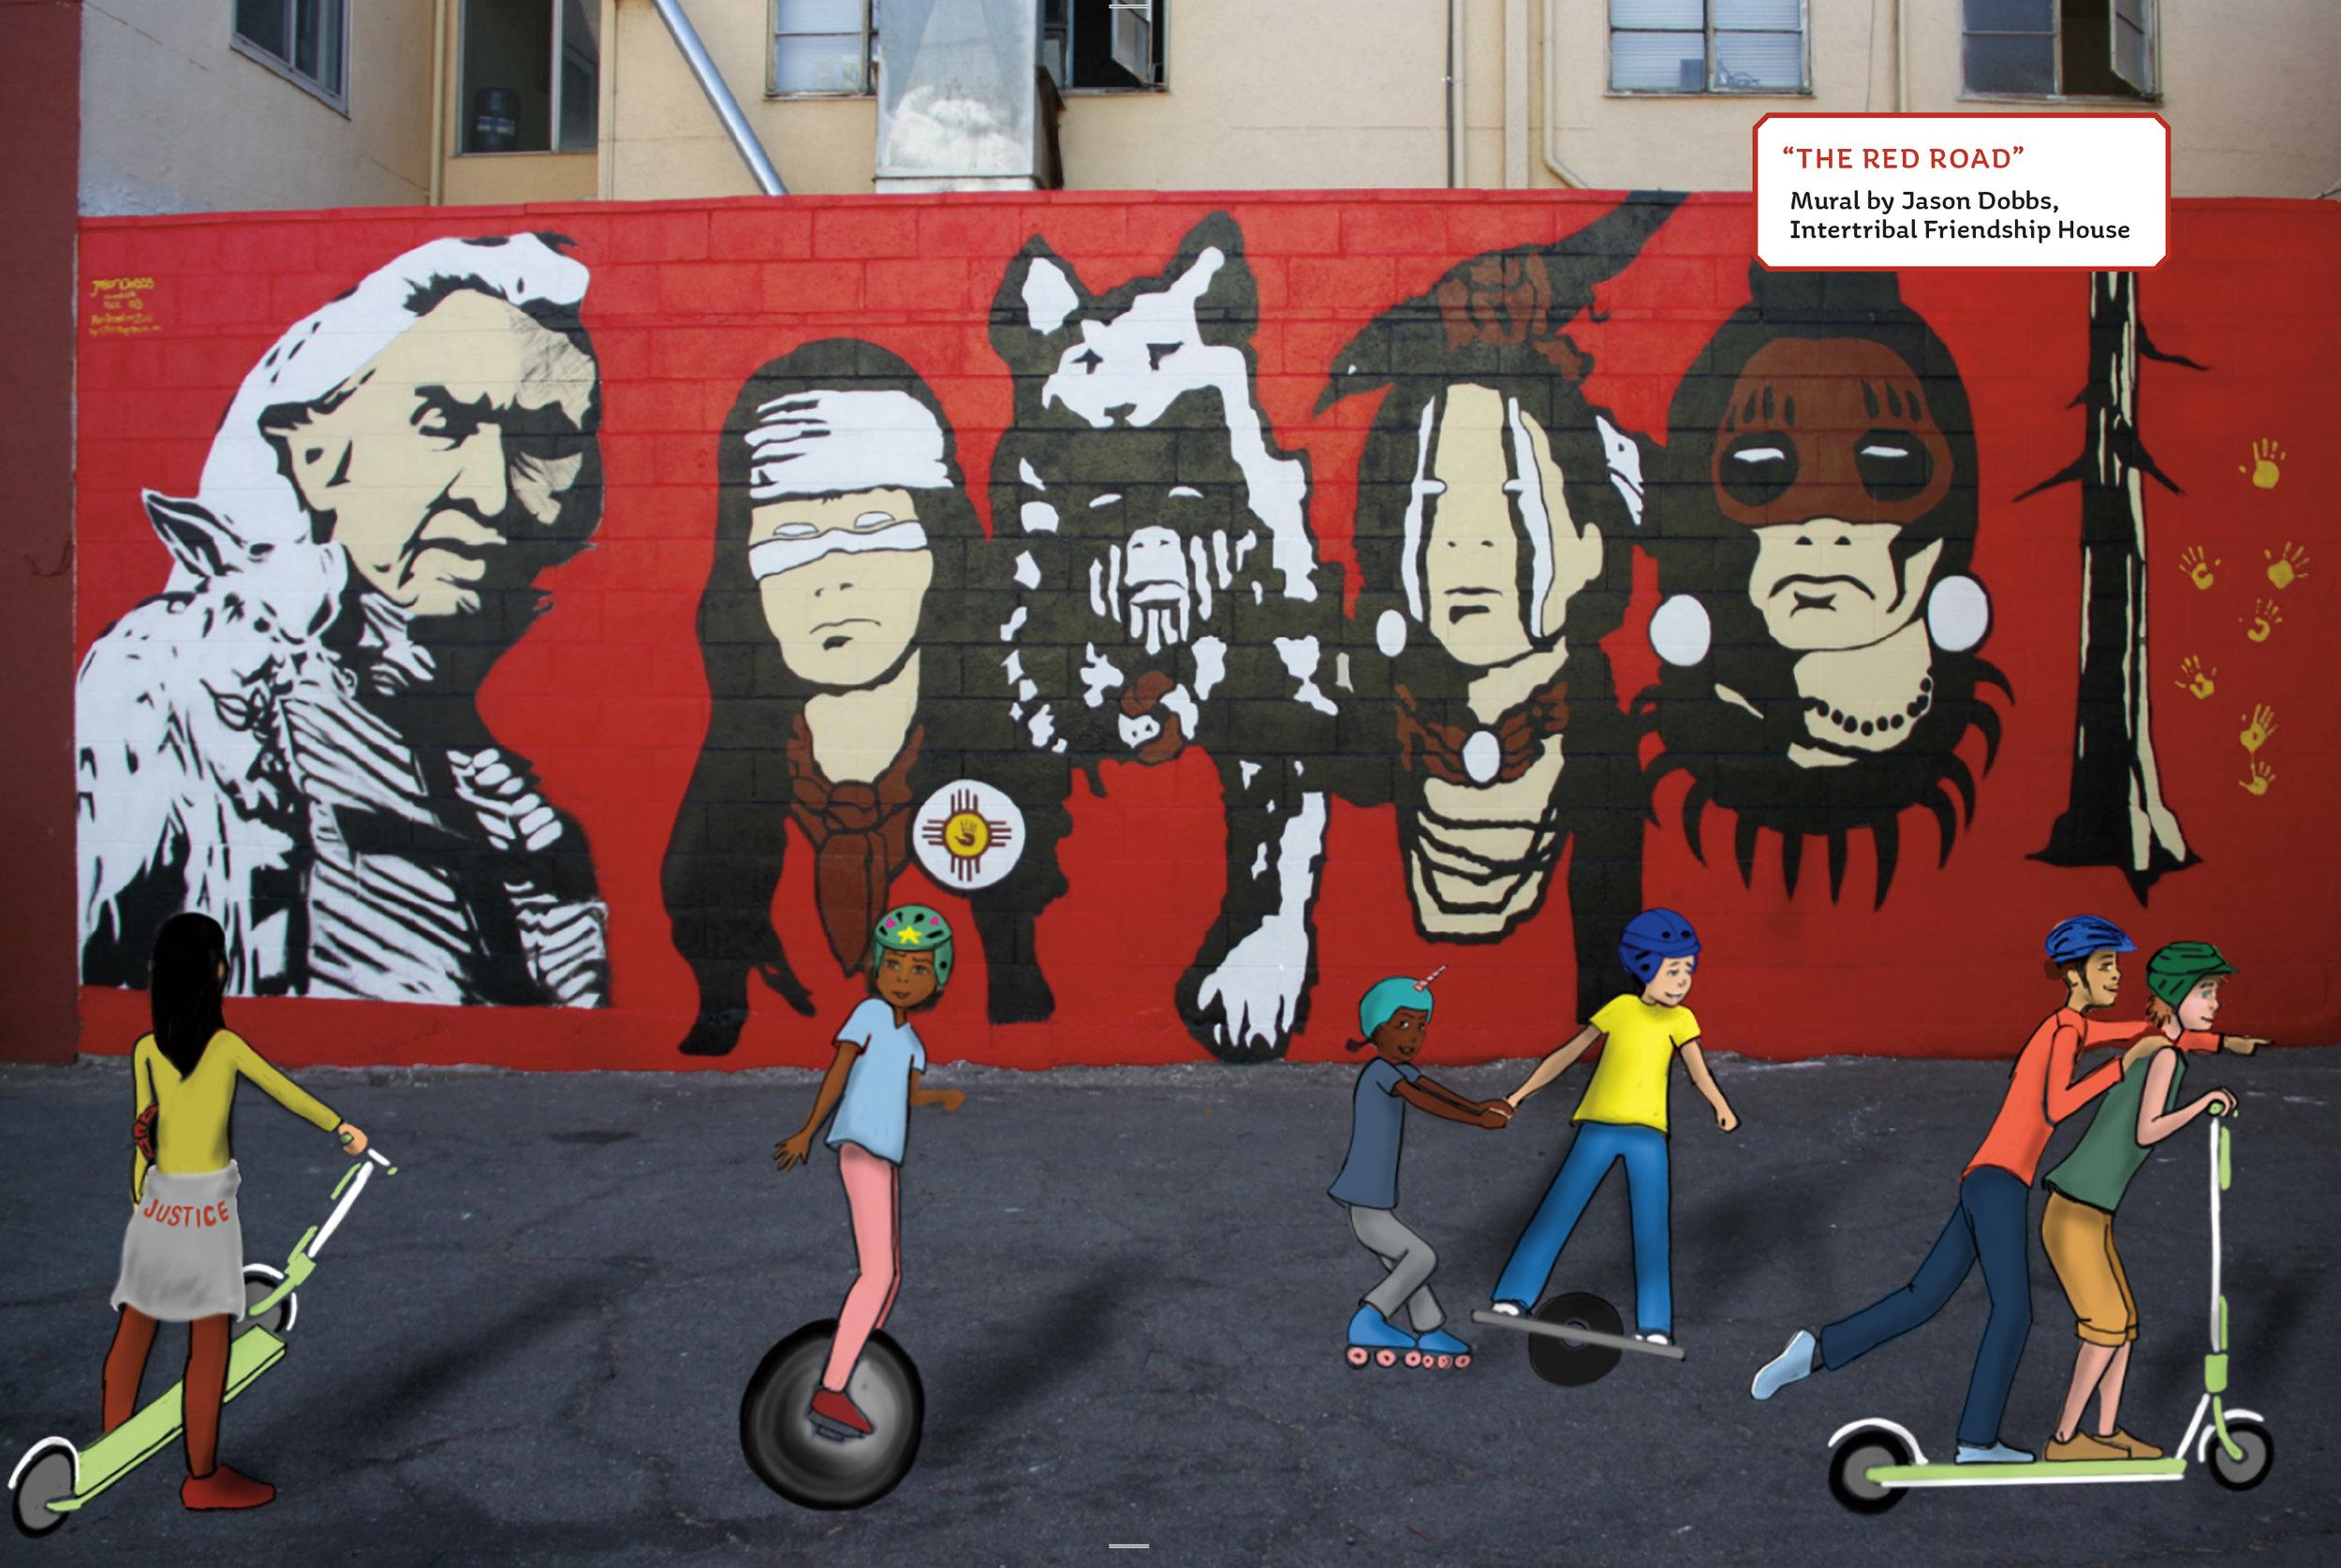 The-Red-Road-Mural.jpg